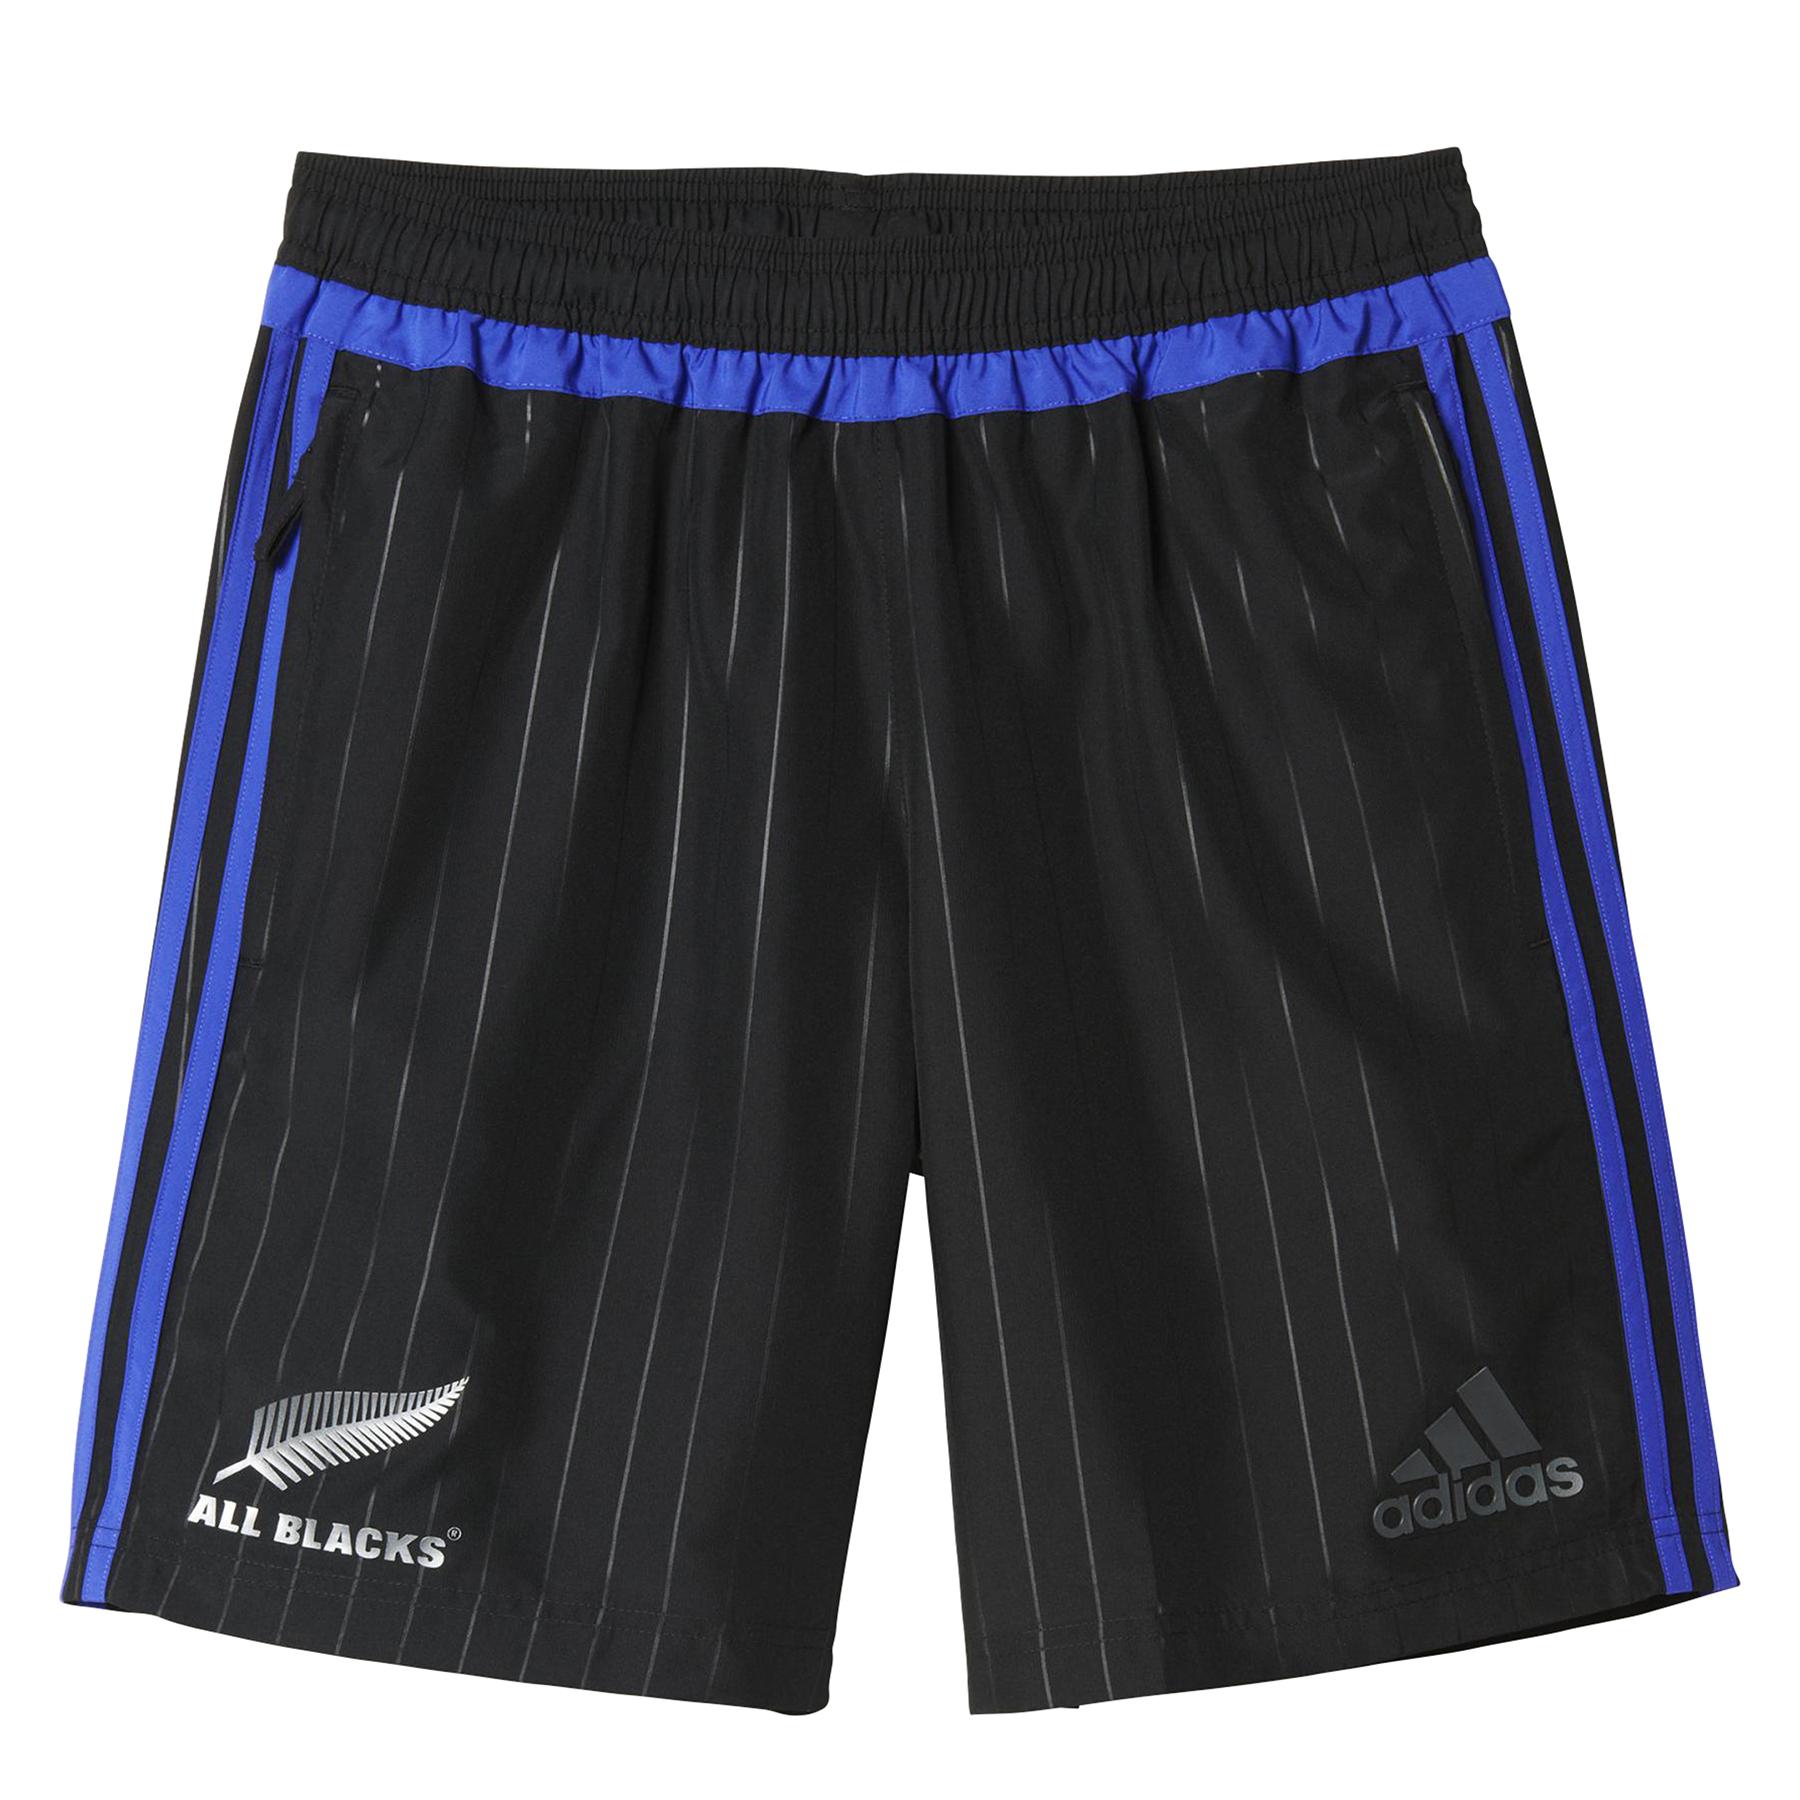 All Blacks Rugby Woven Short Black